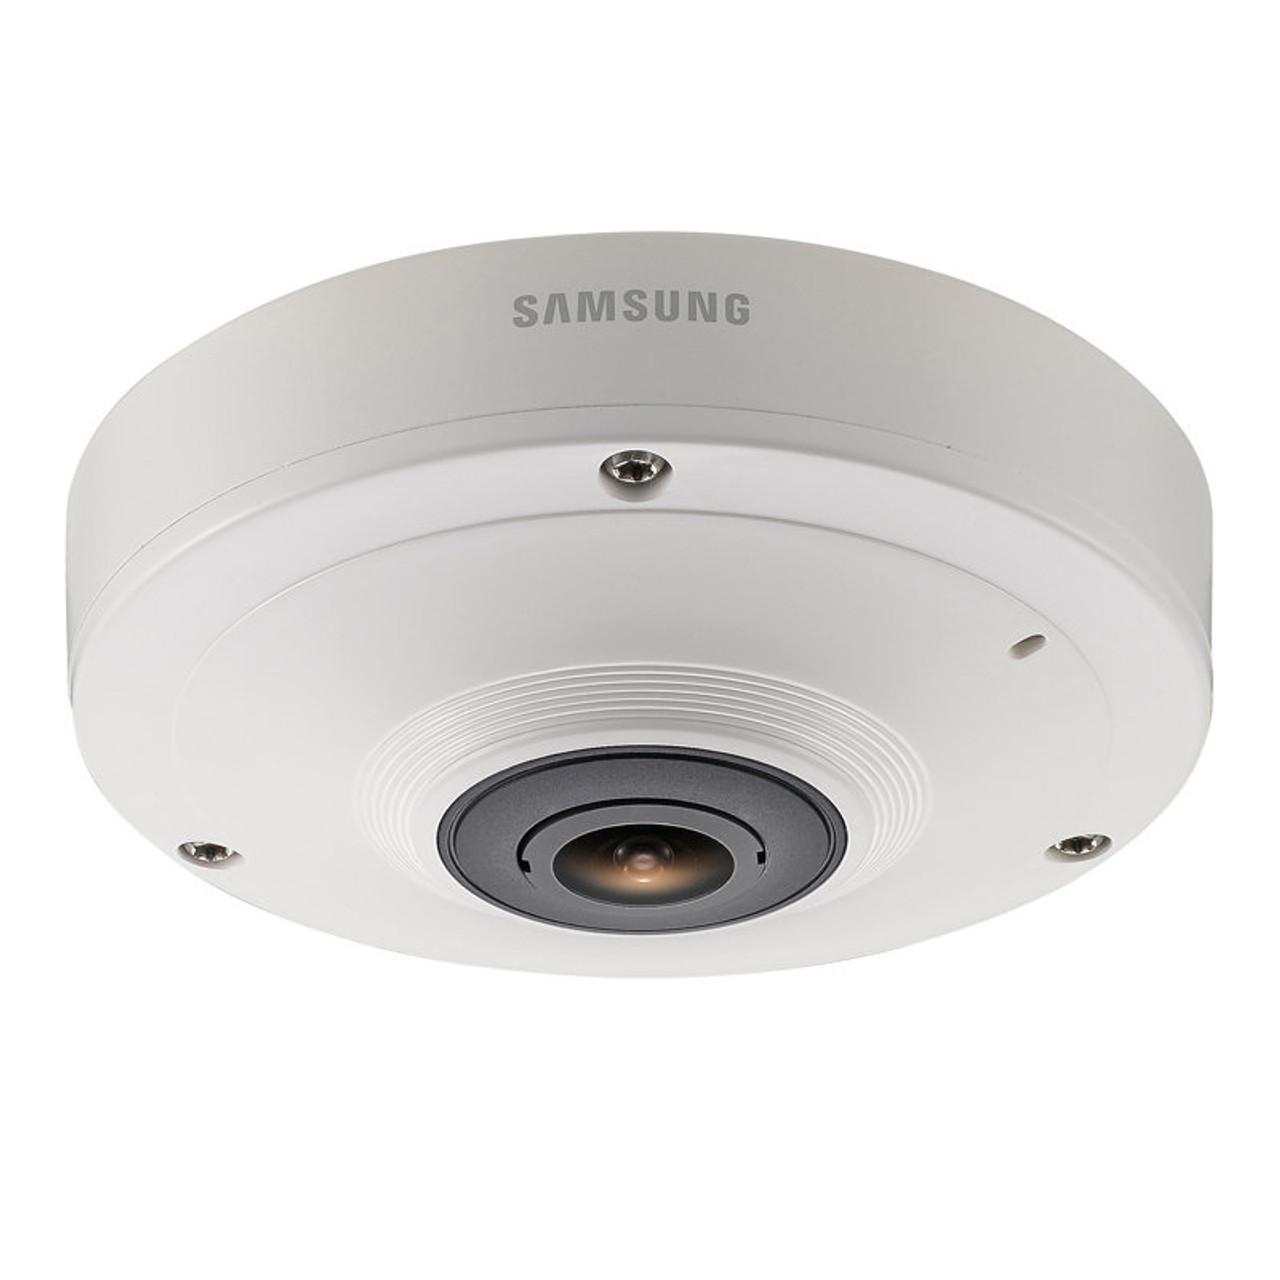 Samsung SNF-7010V Outdoor 1080P HD 360-degree Fisheye IP Security Camera